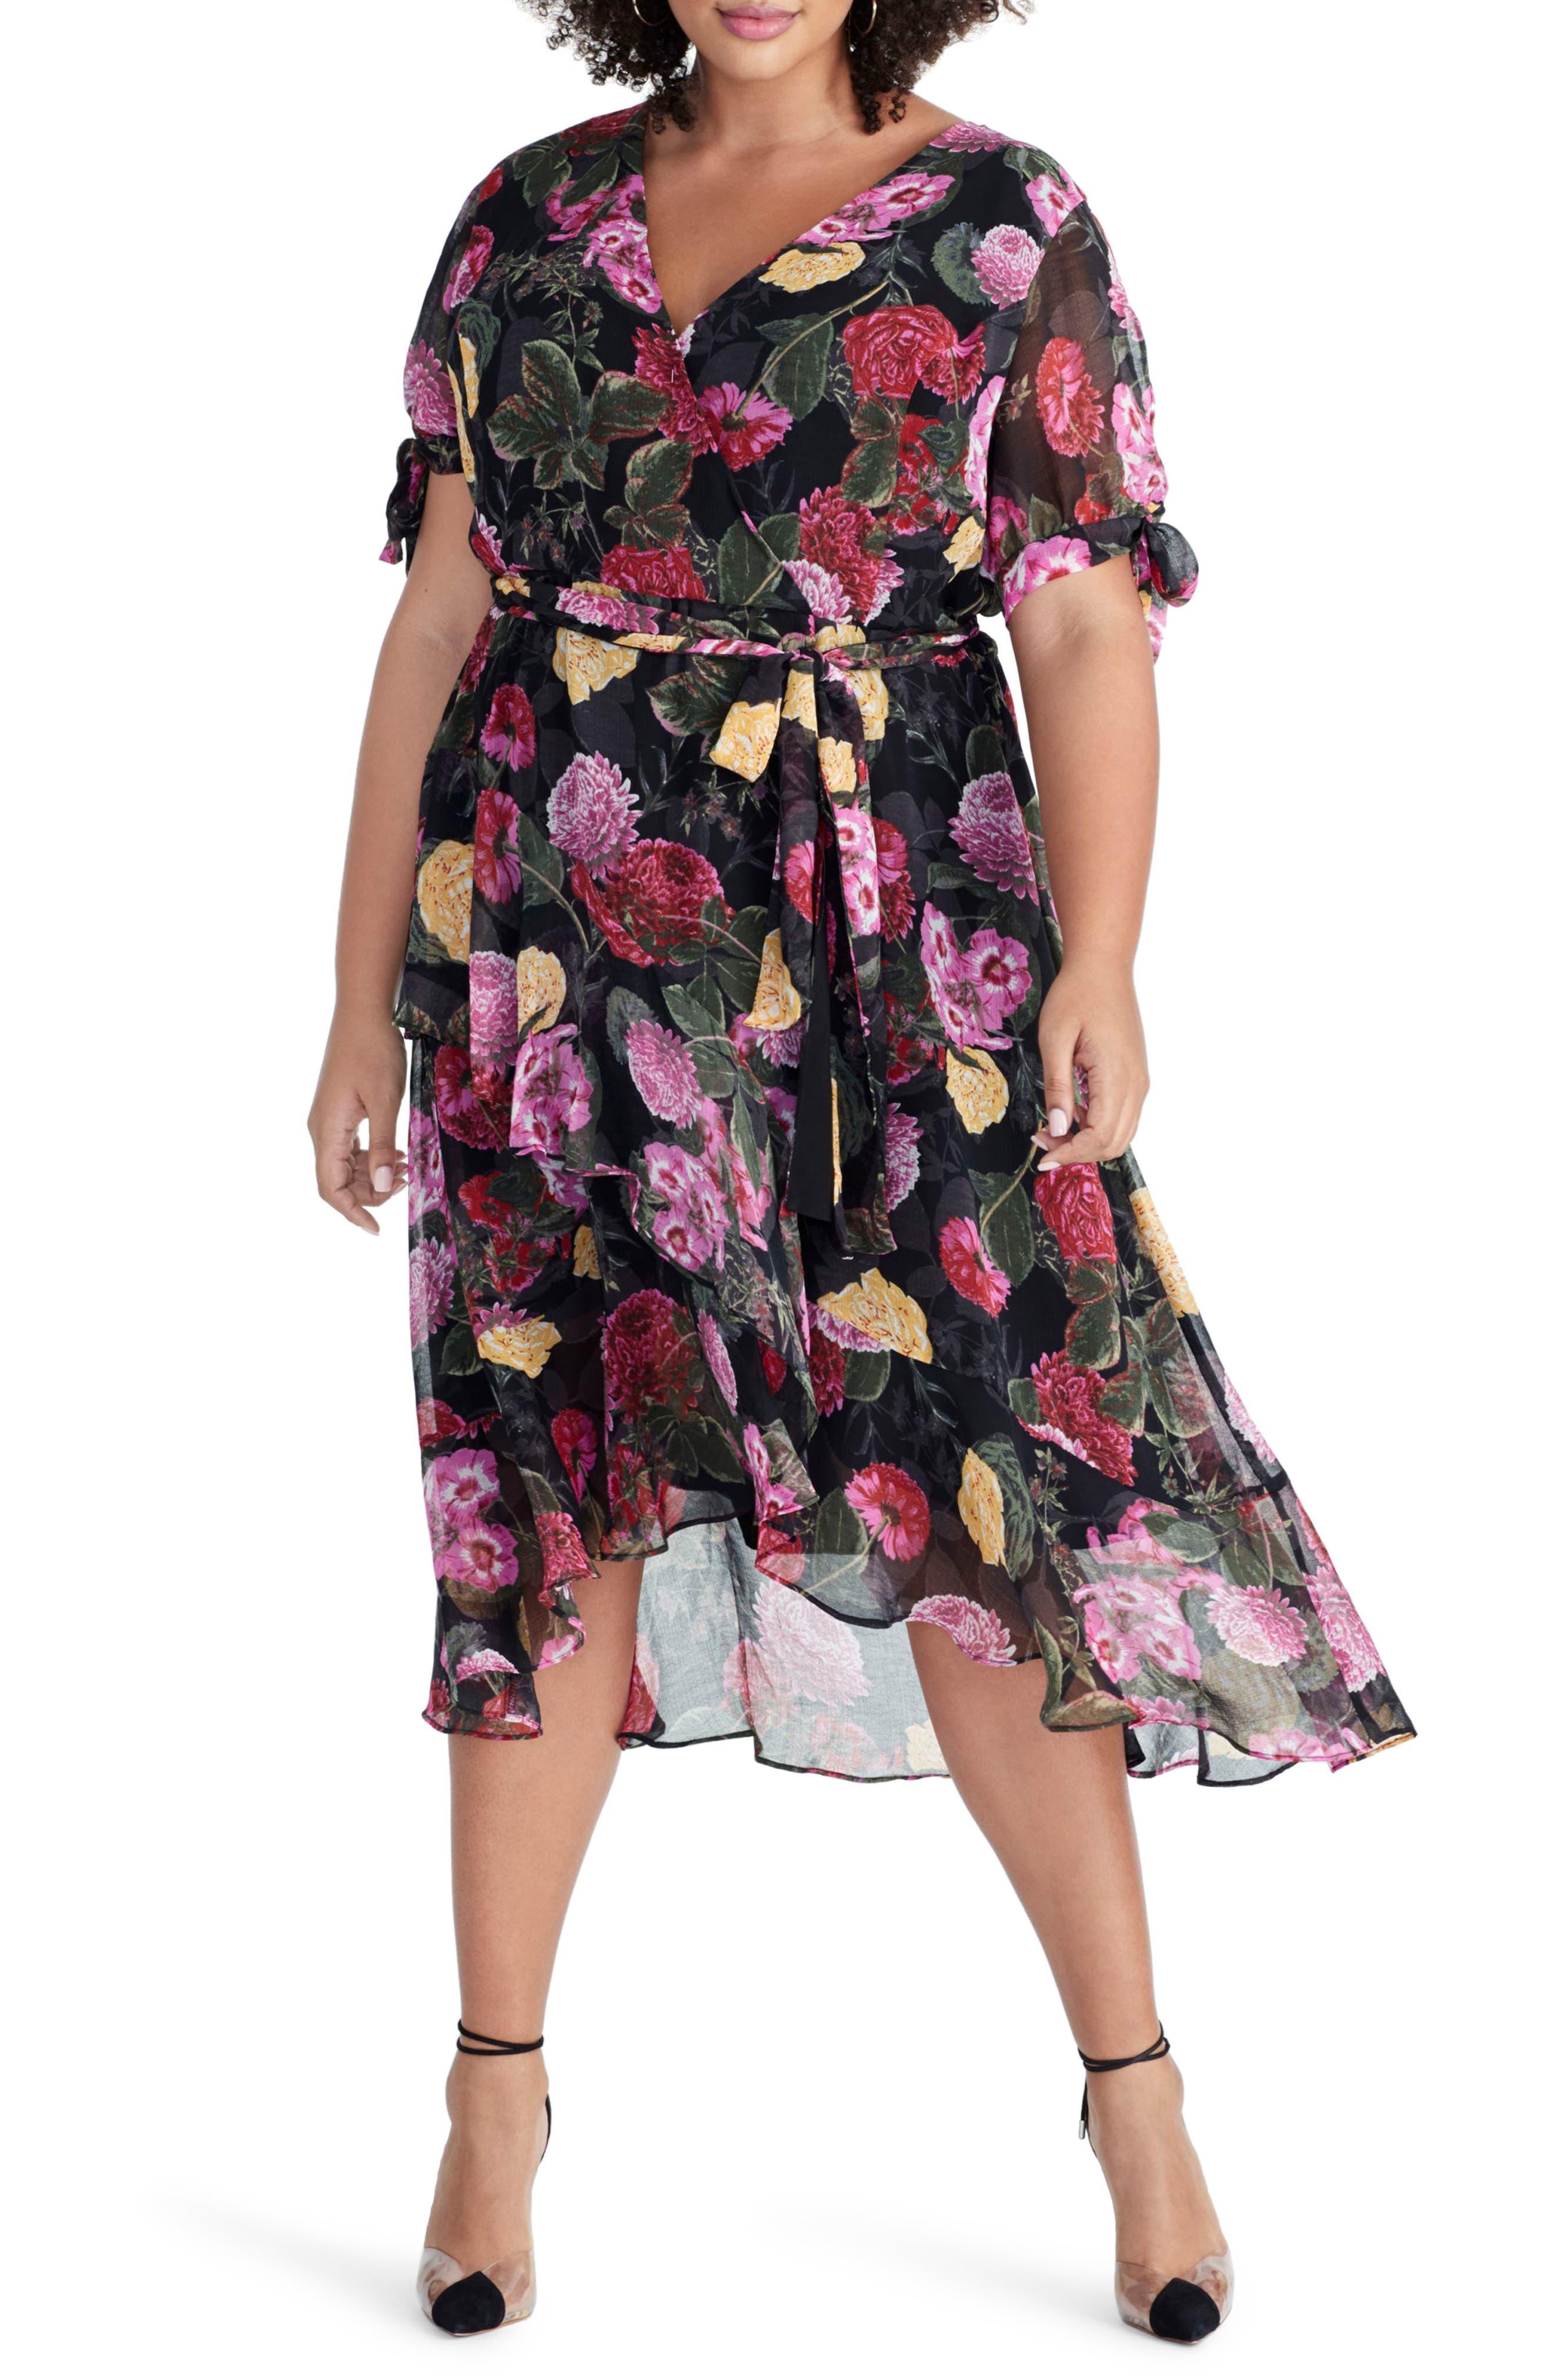 Plus Size Rachel Rachel Roy Rina Floral Print Chiffon Dress, Black